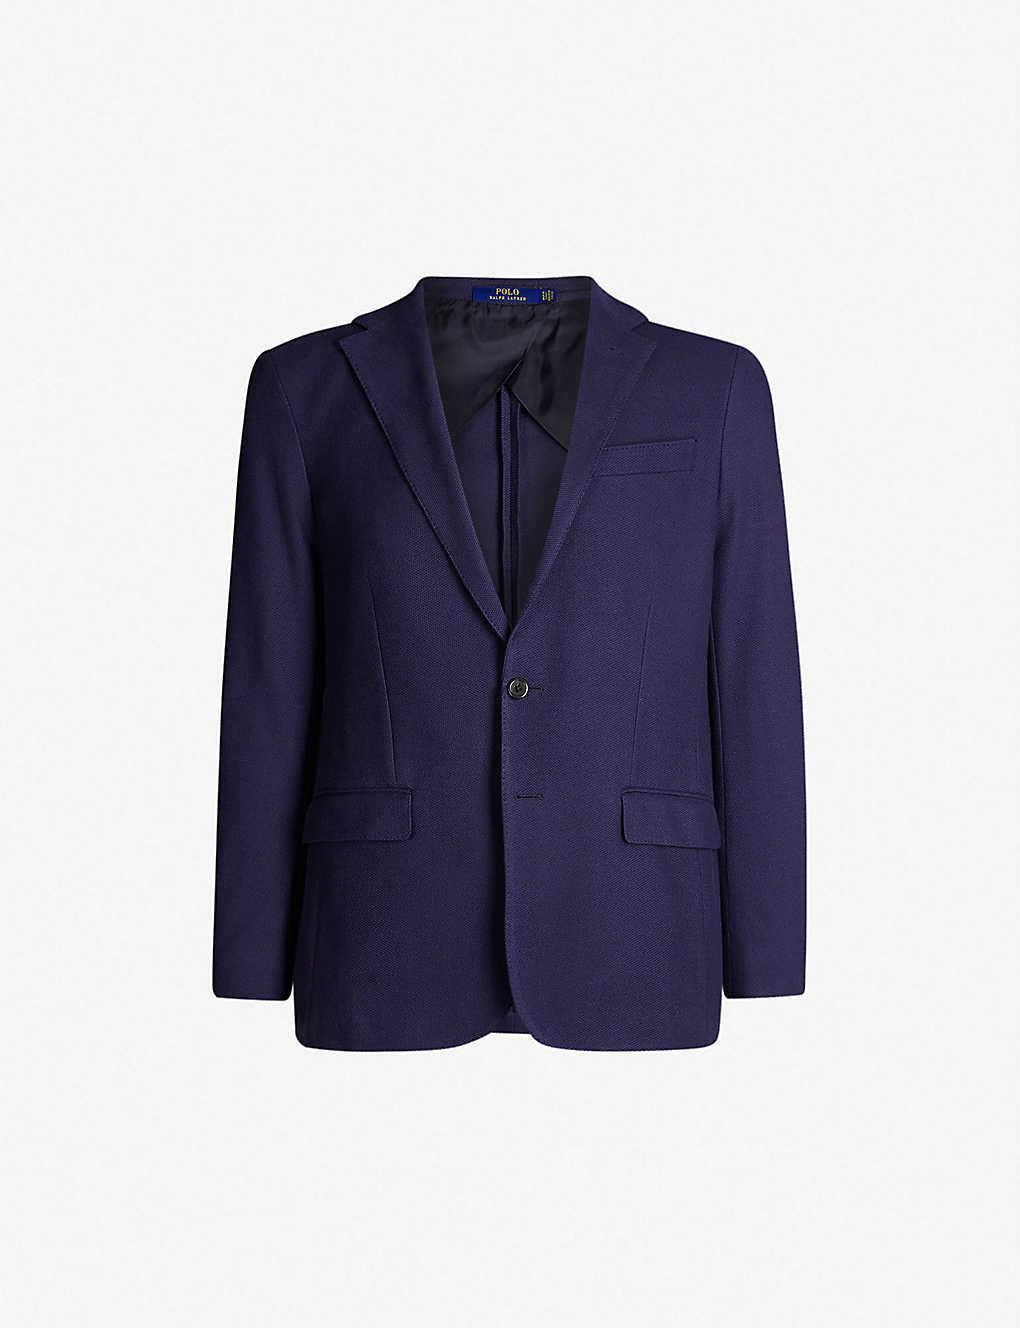 269290e3 POLO RALPH LAUREN - Single-breasted regular-fit cotton blazer ...